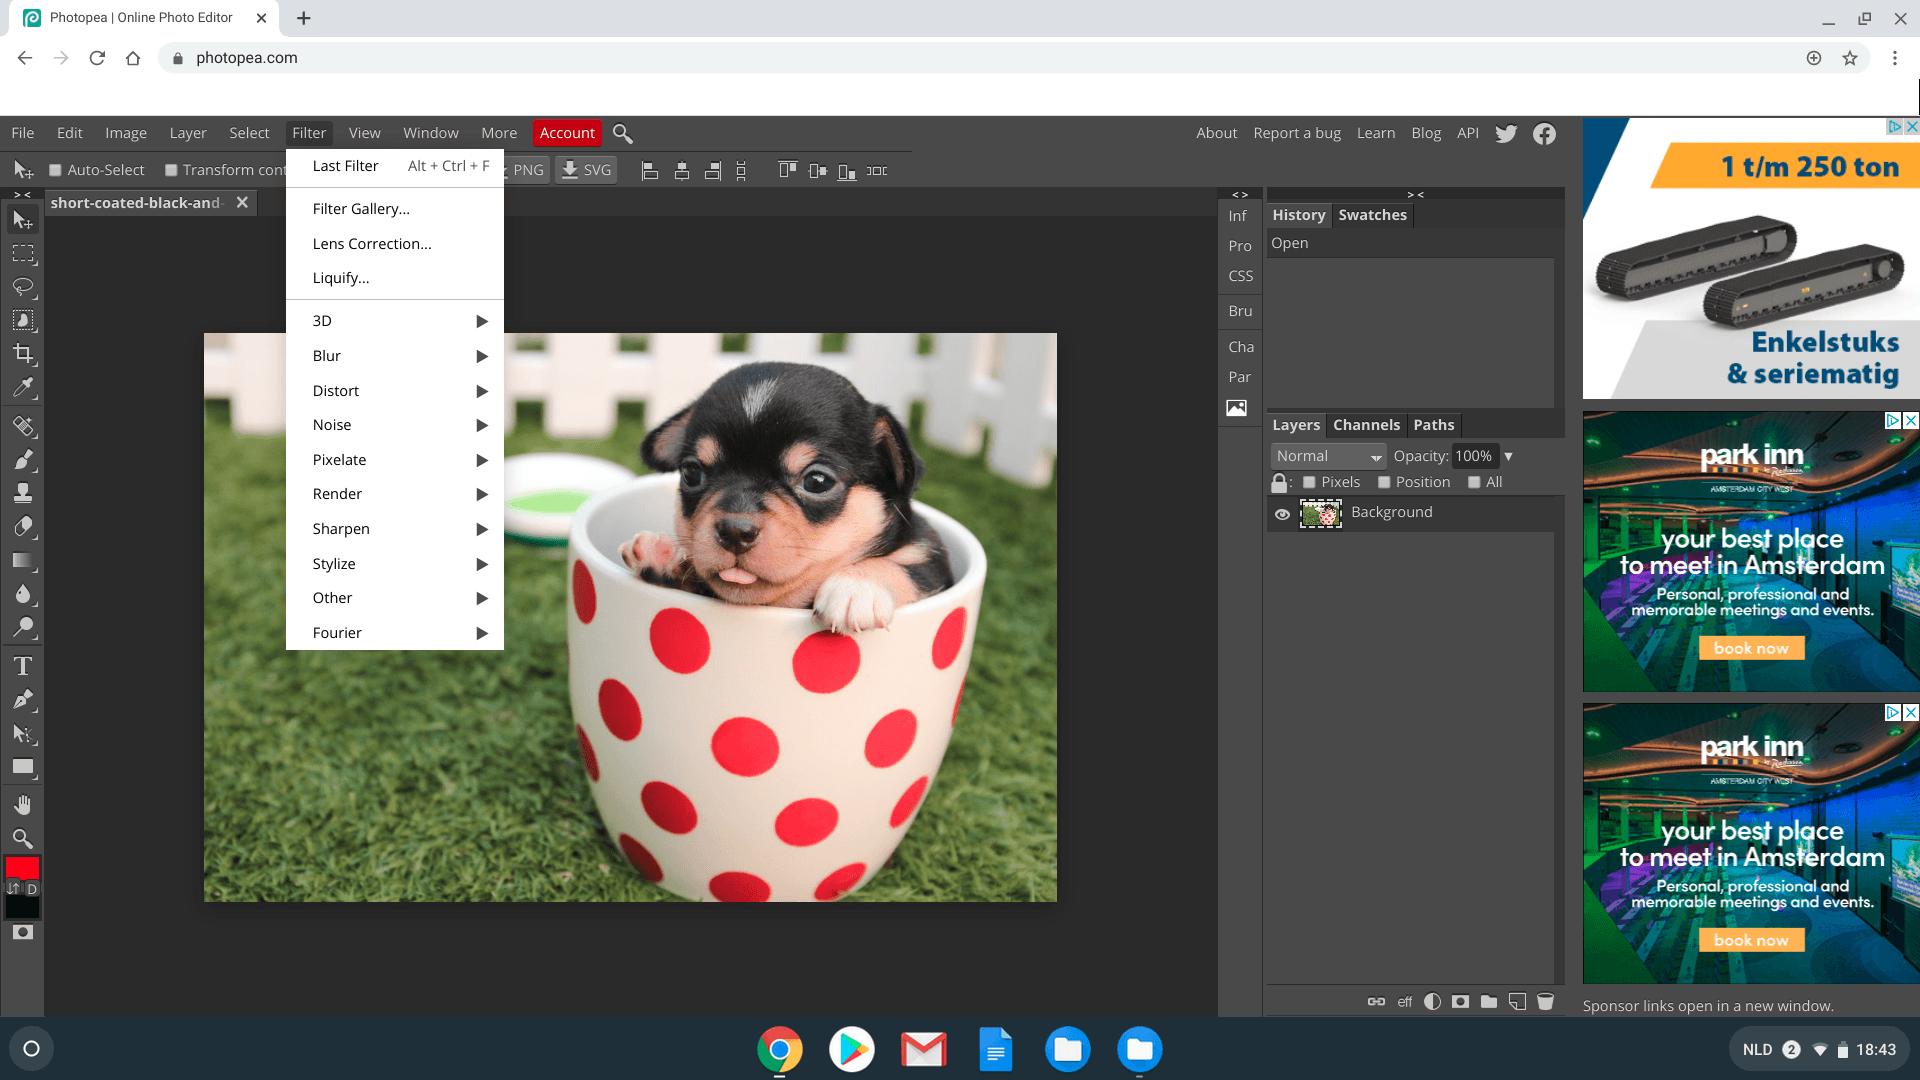 photopea chromebook foto bewerken - programmas chromebooks